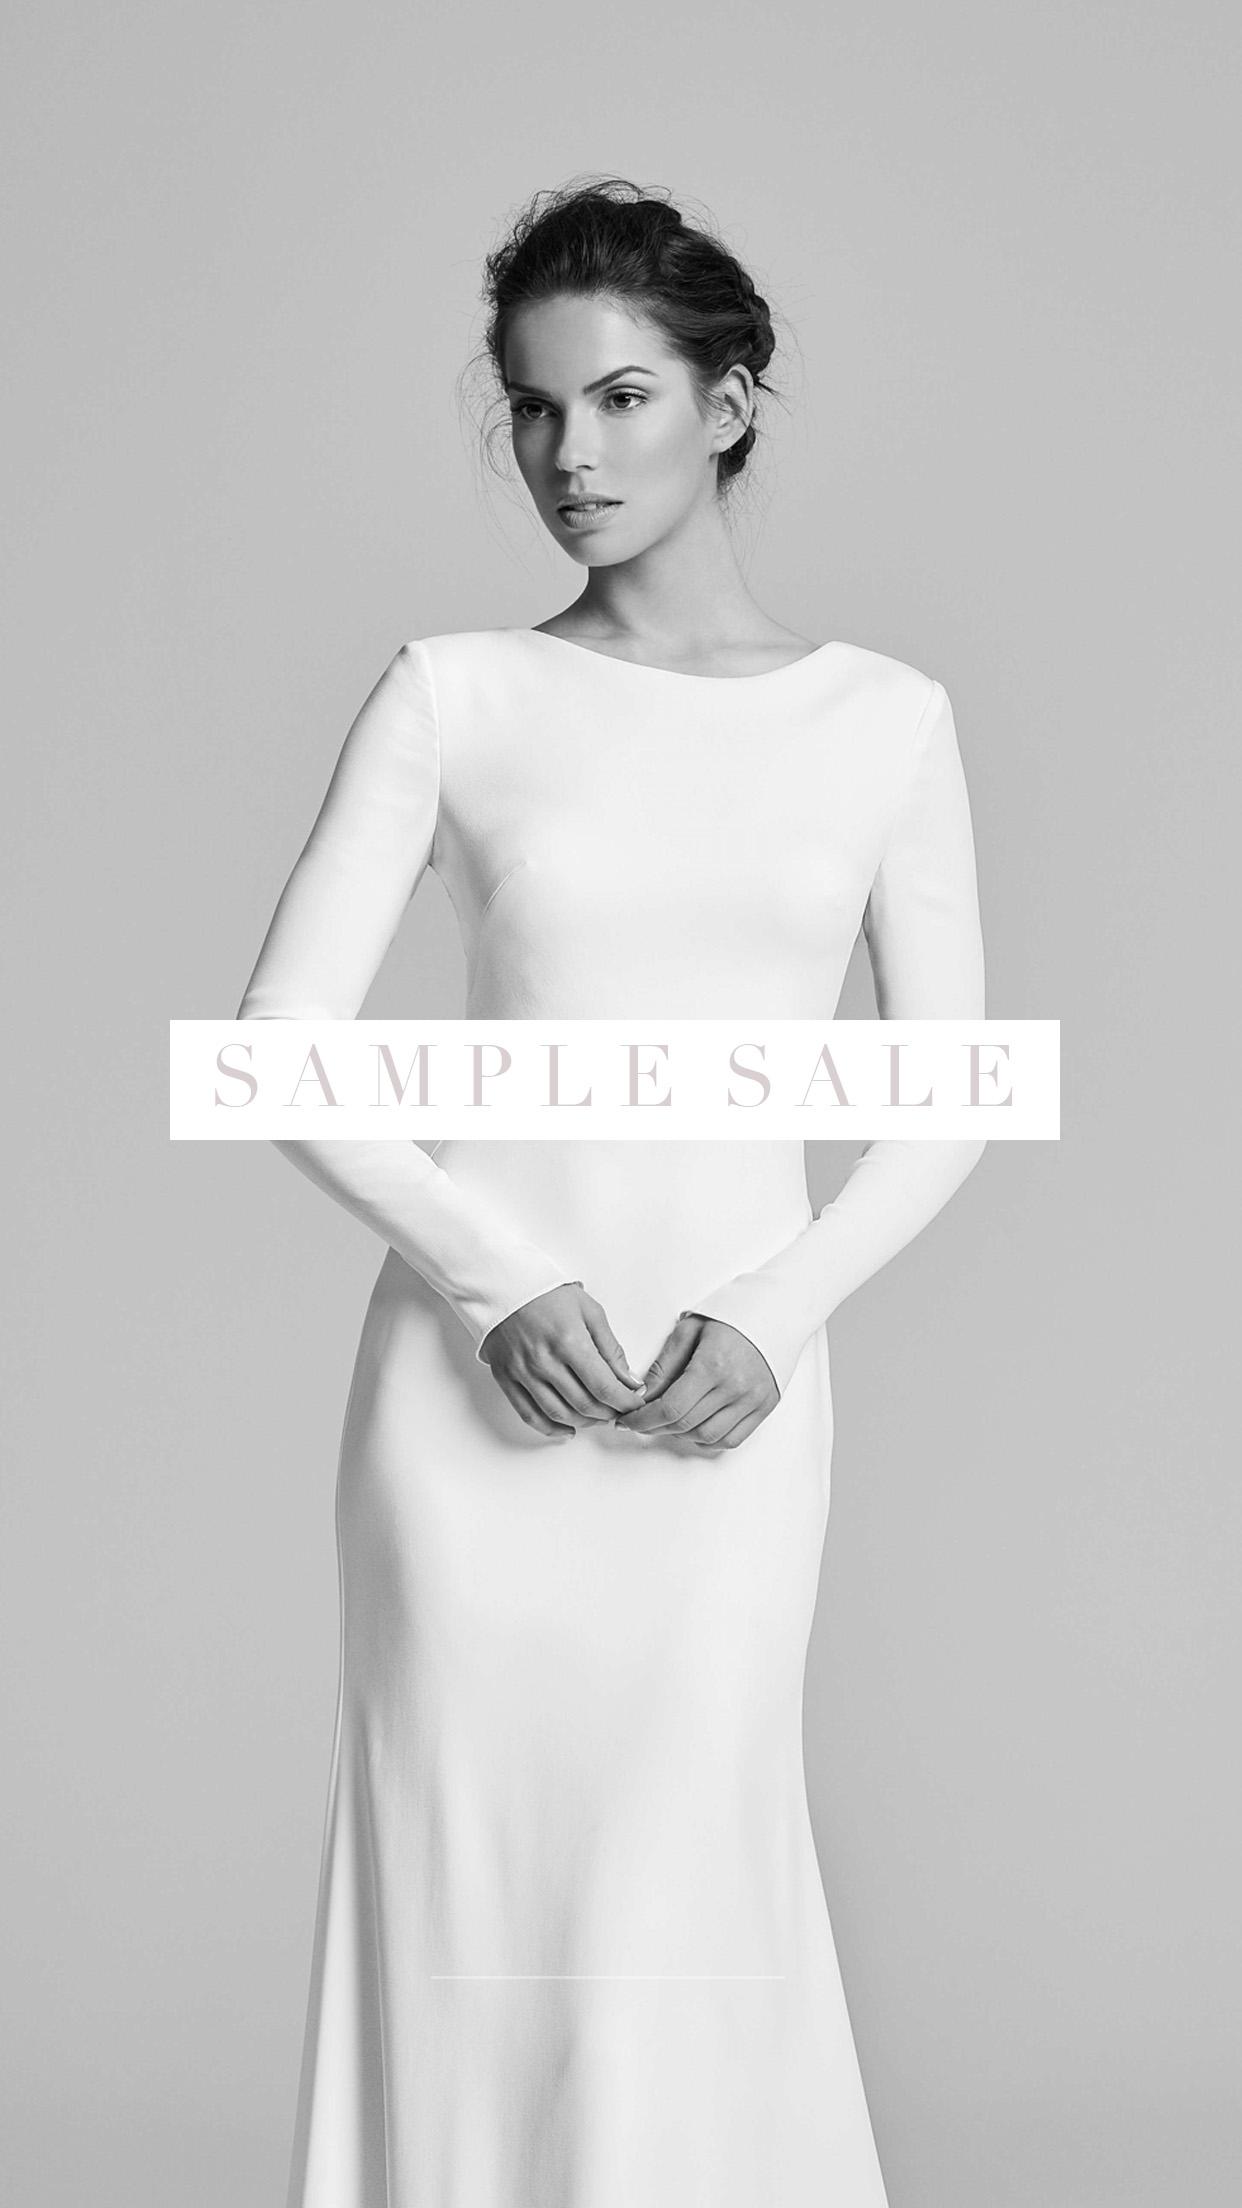 Wedding Dress Sample Sale - Altrincham, Cheshire, Manchester - Suzanne Neville